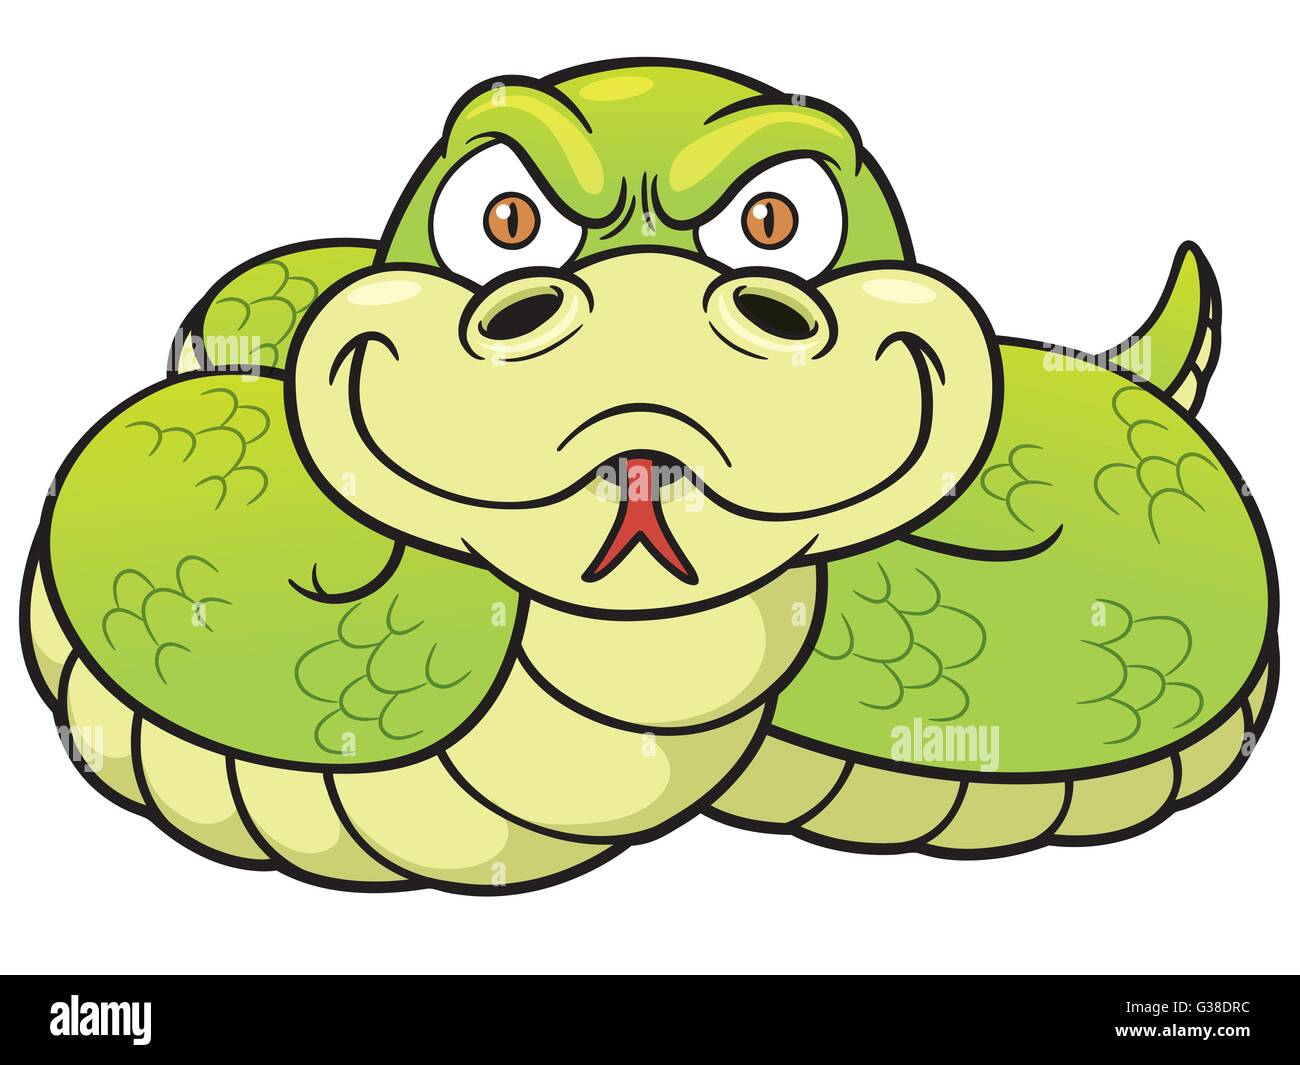 Dessin Animé Serpent vector illustration de serpent dessin animé vecteurs et illustration